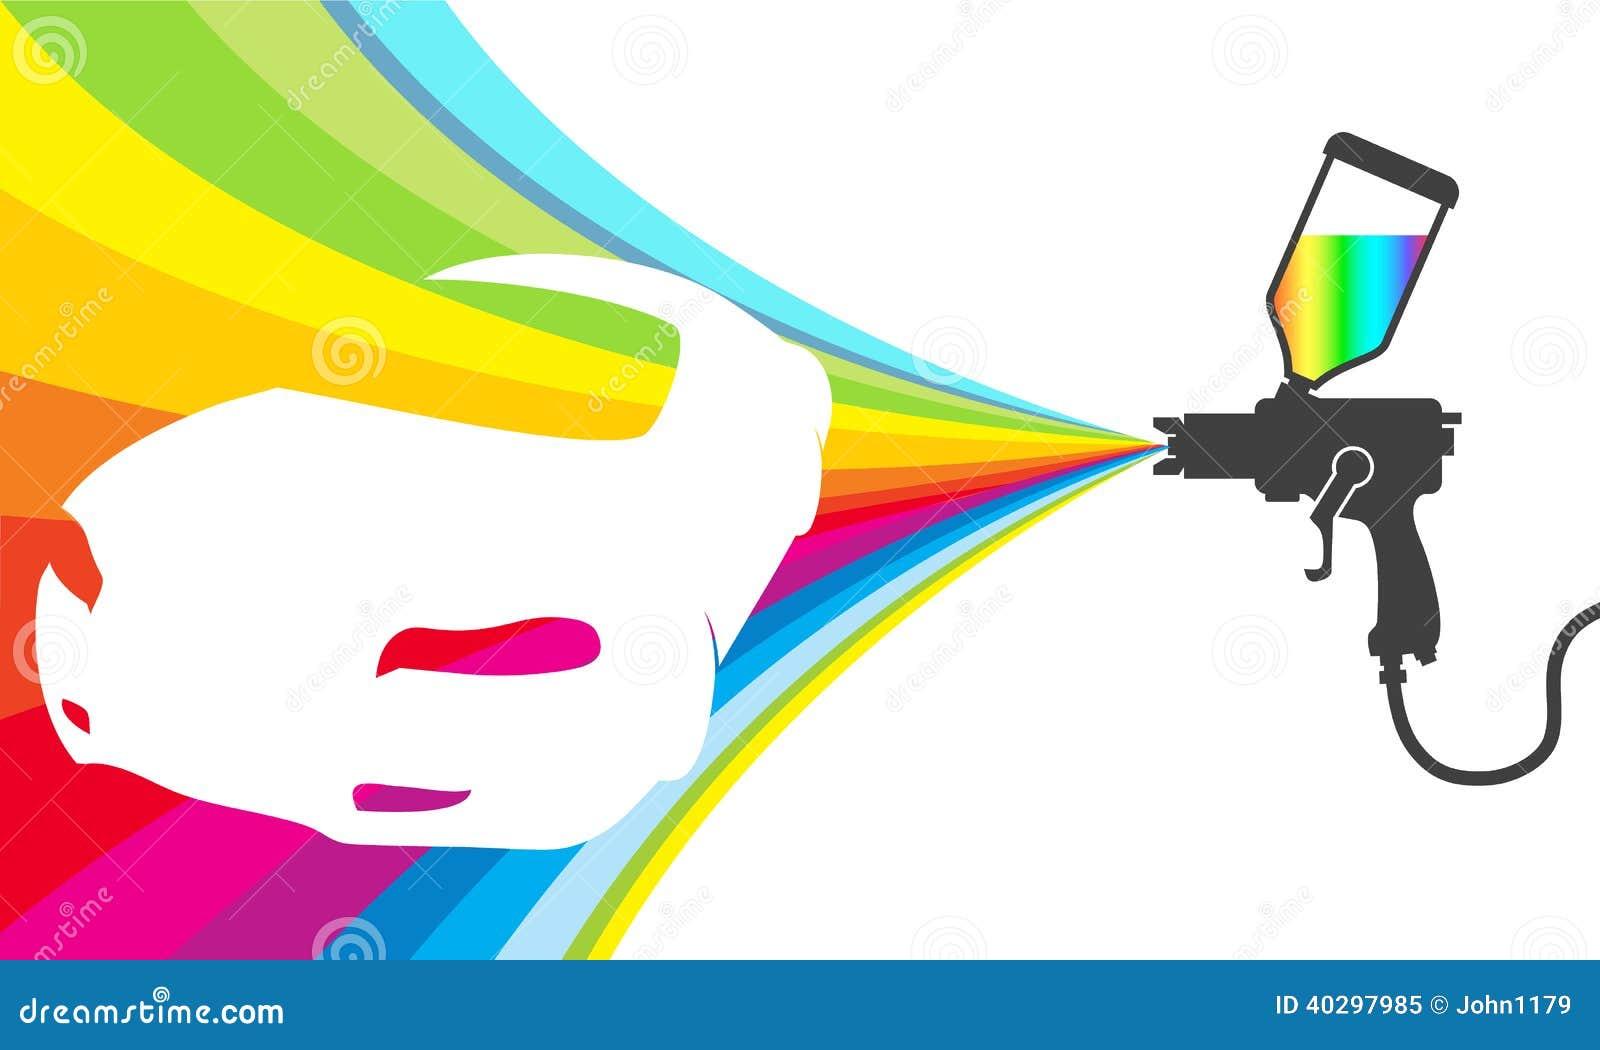 Car Wash Spray Gun Car Painting Vector Stock Vector - Image: 40297985